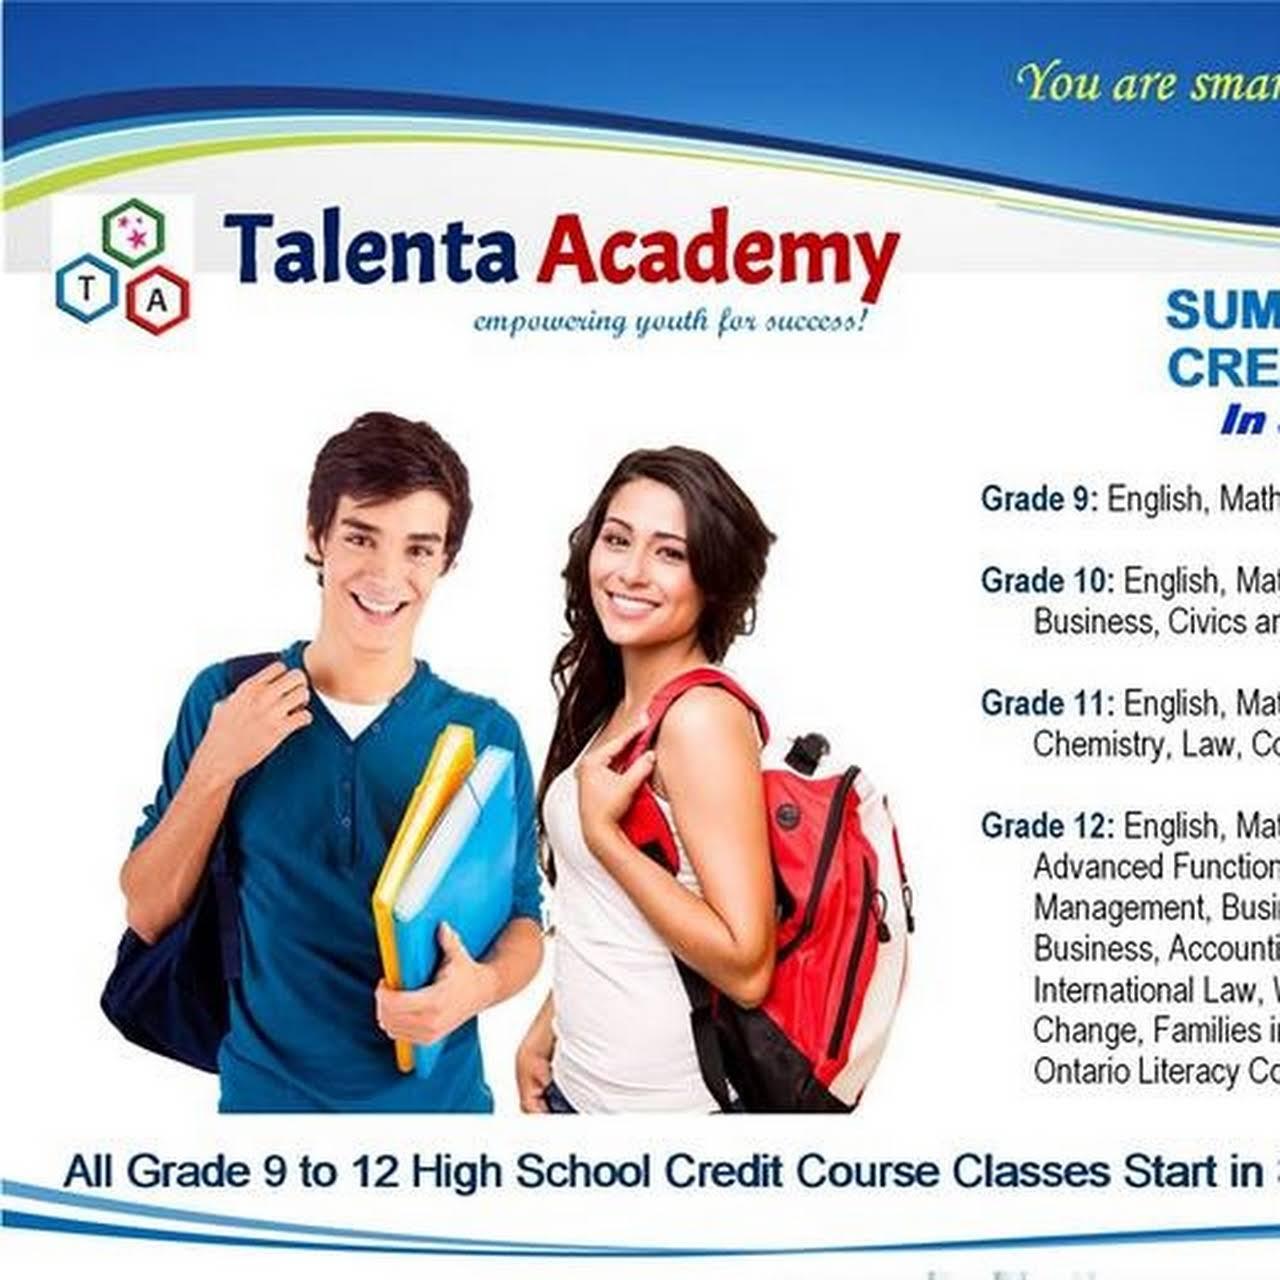 Talenta Academy - Talenta Academy is an Ontario Secondary Private